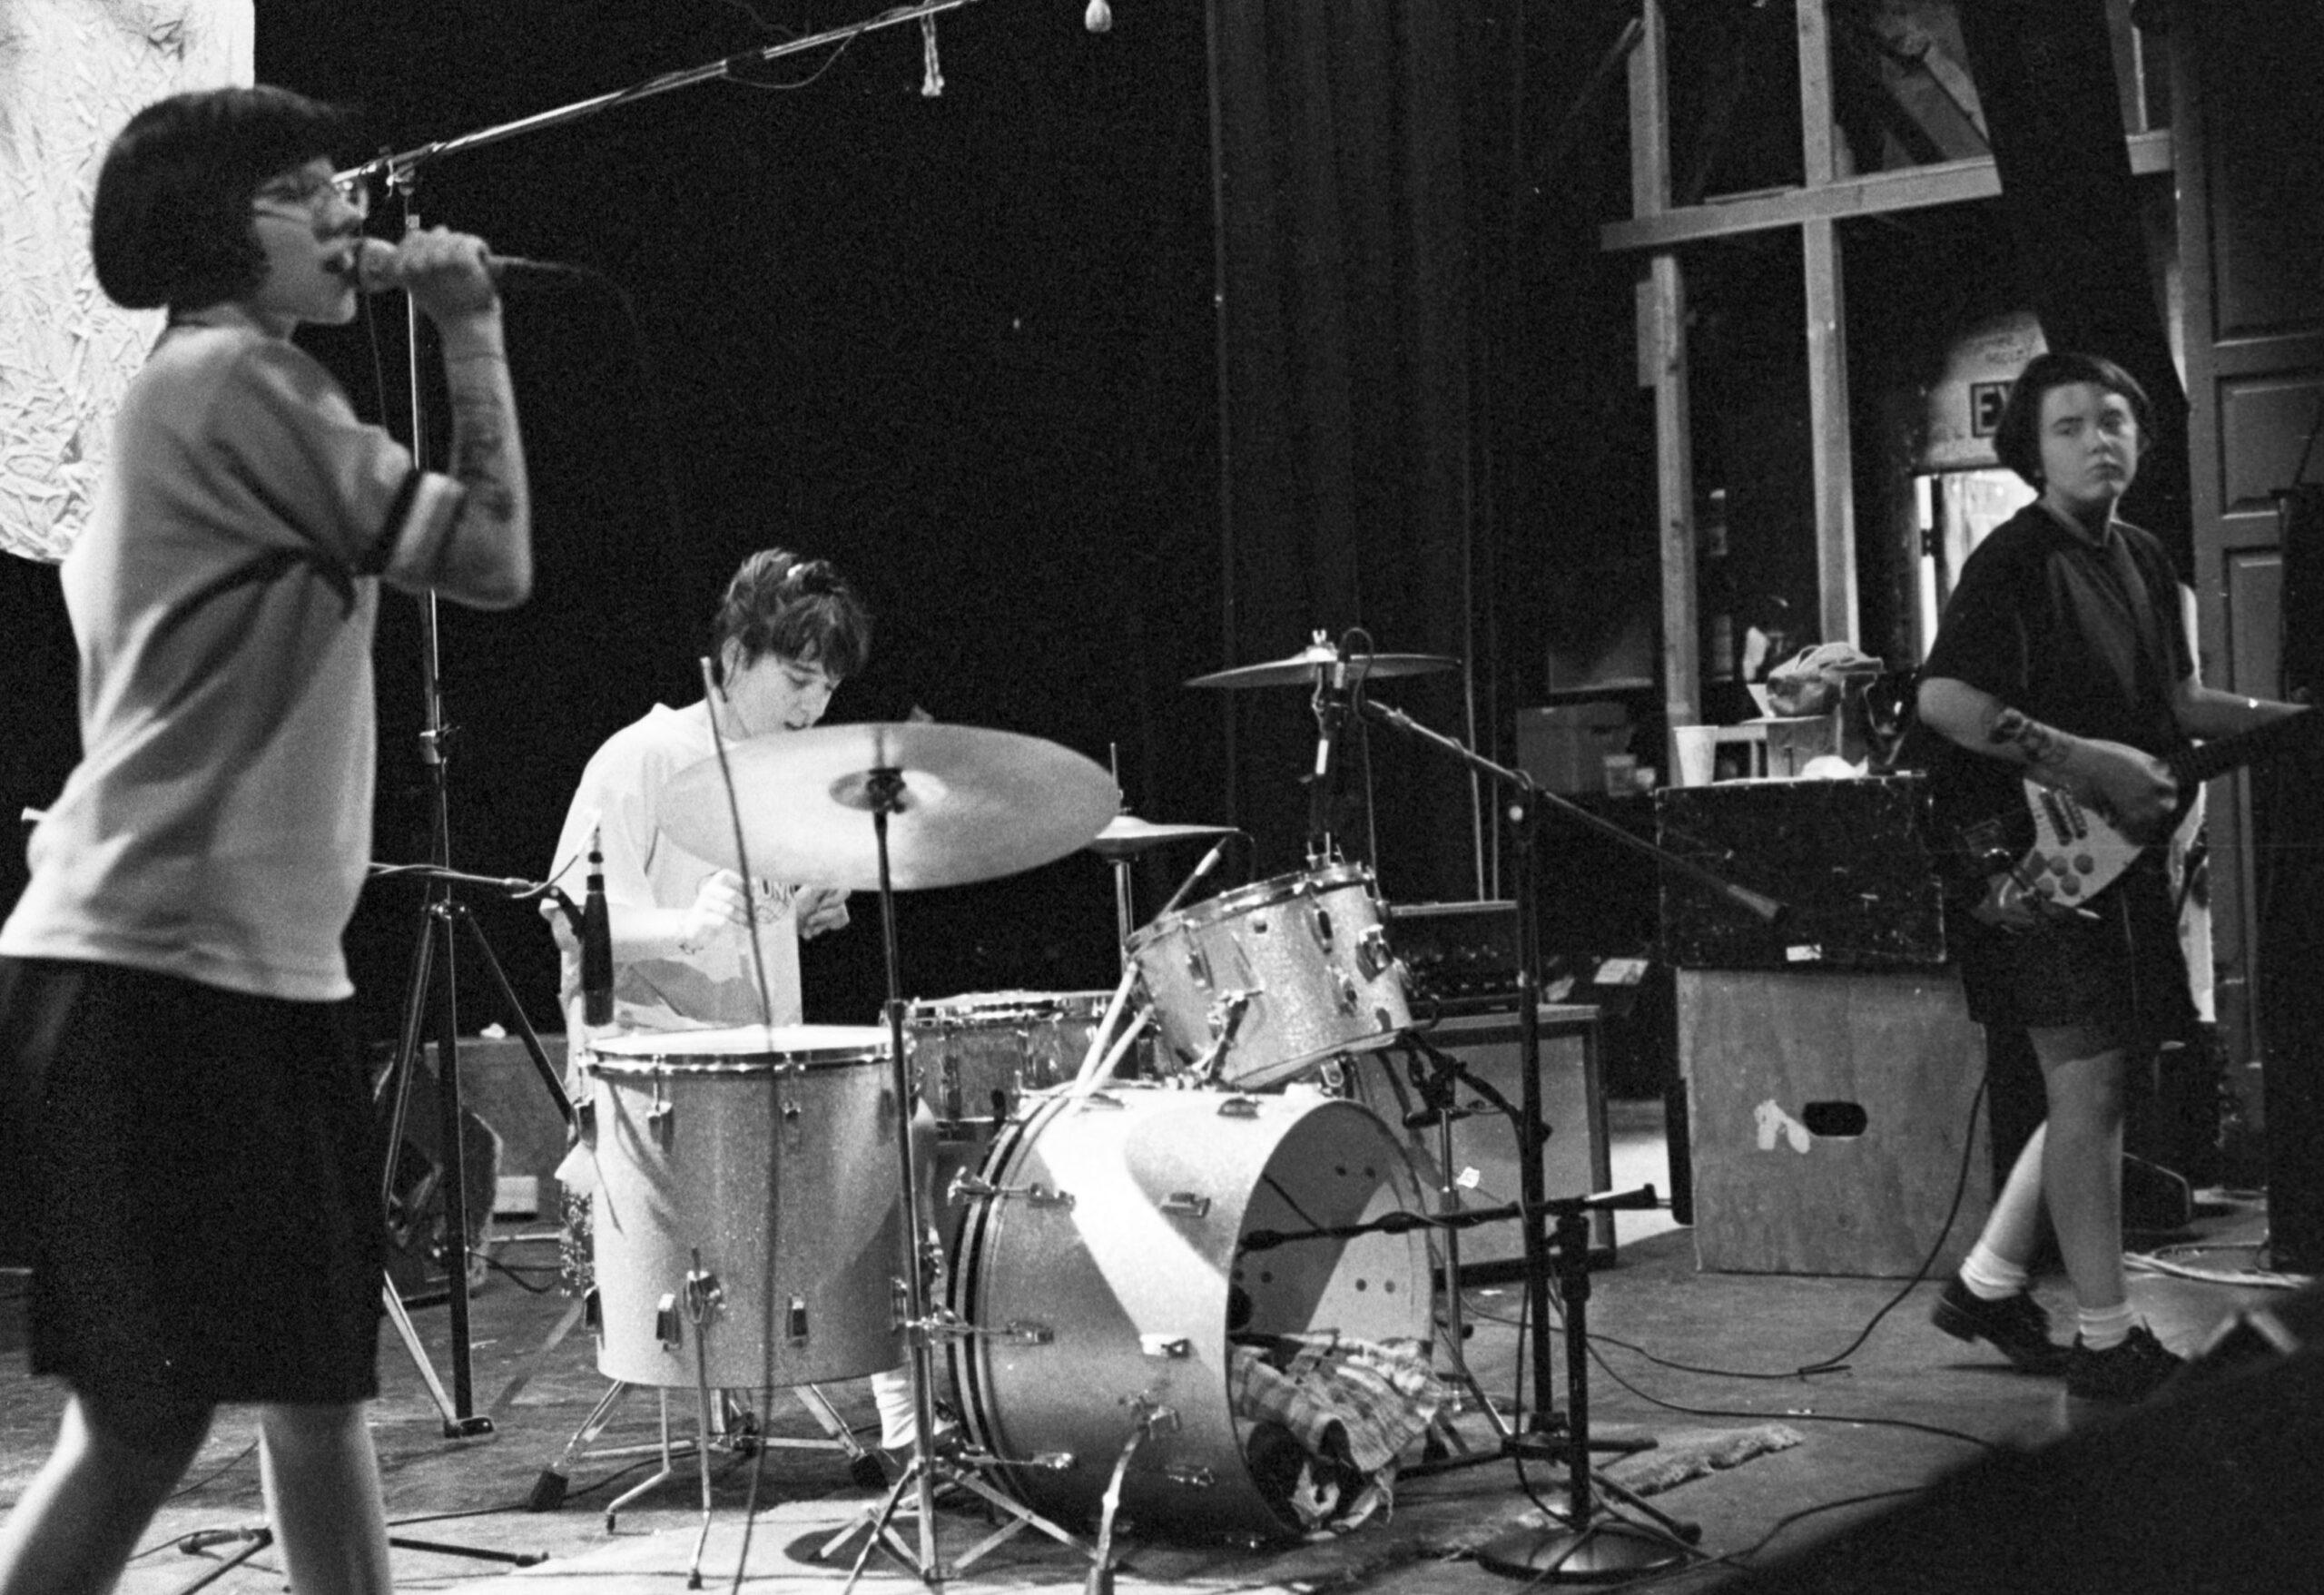 Rock, Roll, Riot, Repeat: An Oral History of Kill Rock Stars